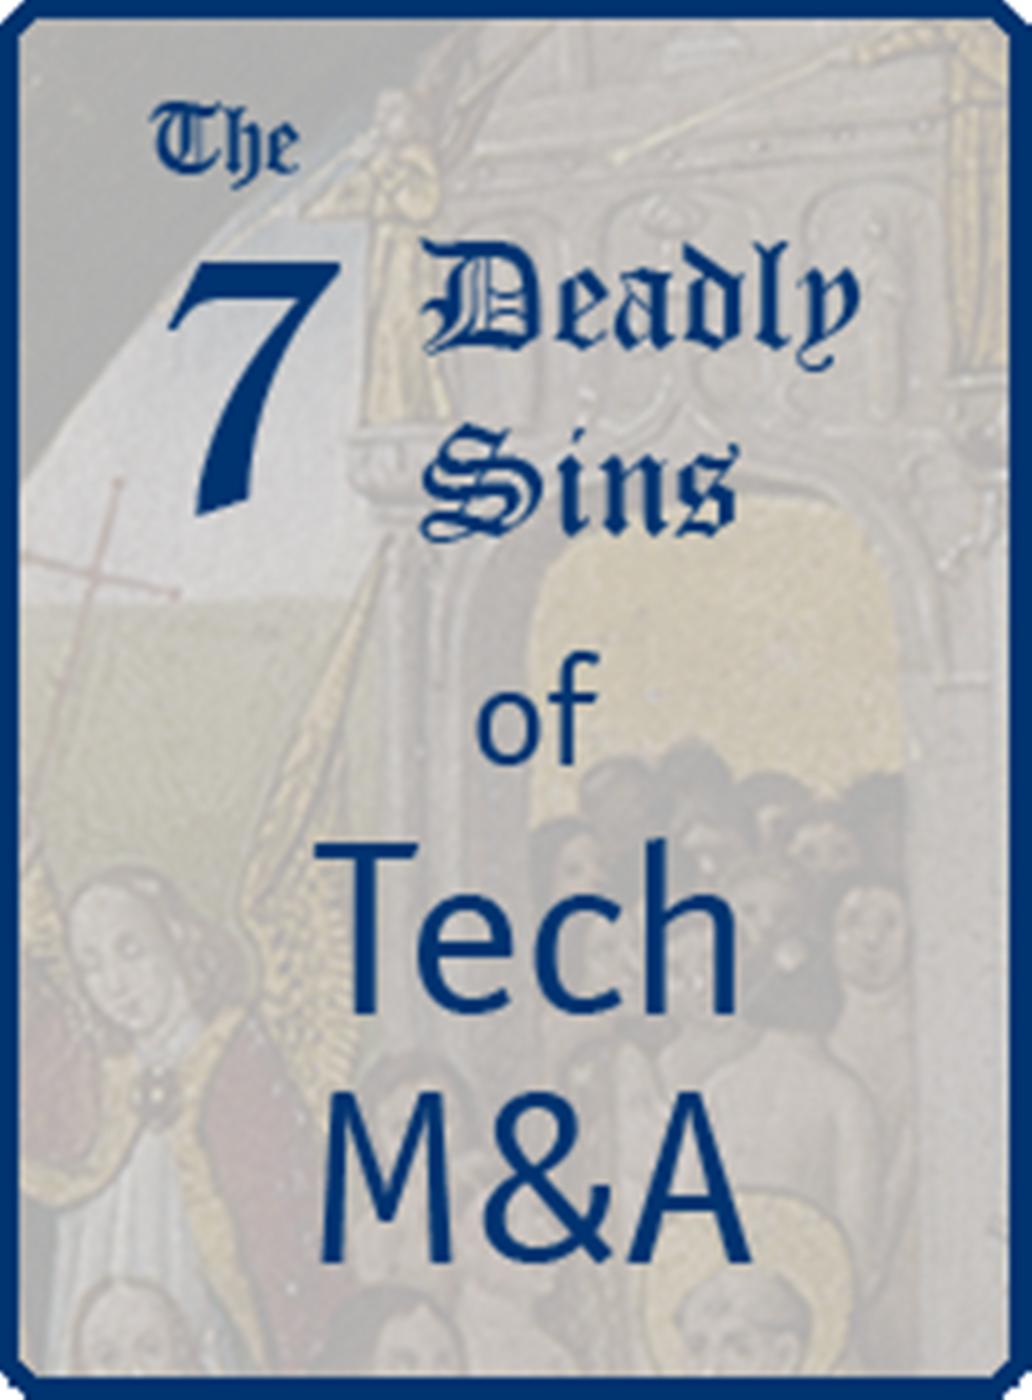 7 Deadly Sins of Tech M&A: #4 & 5